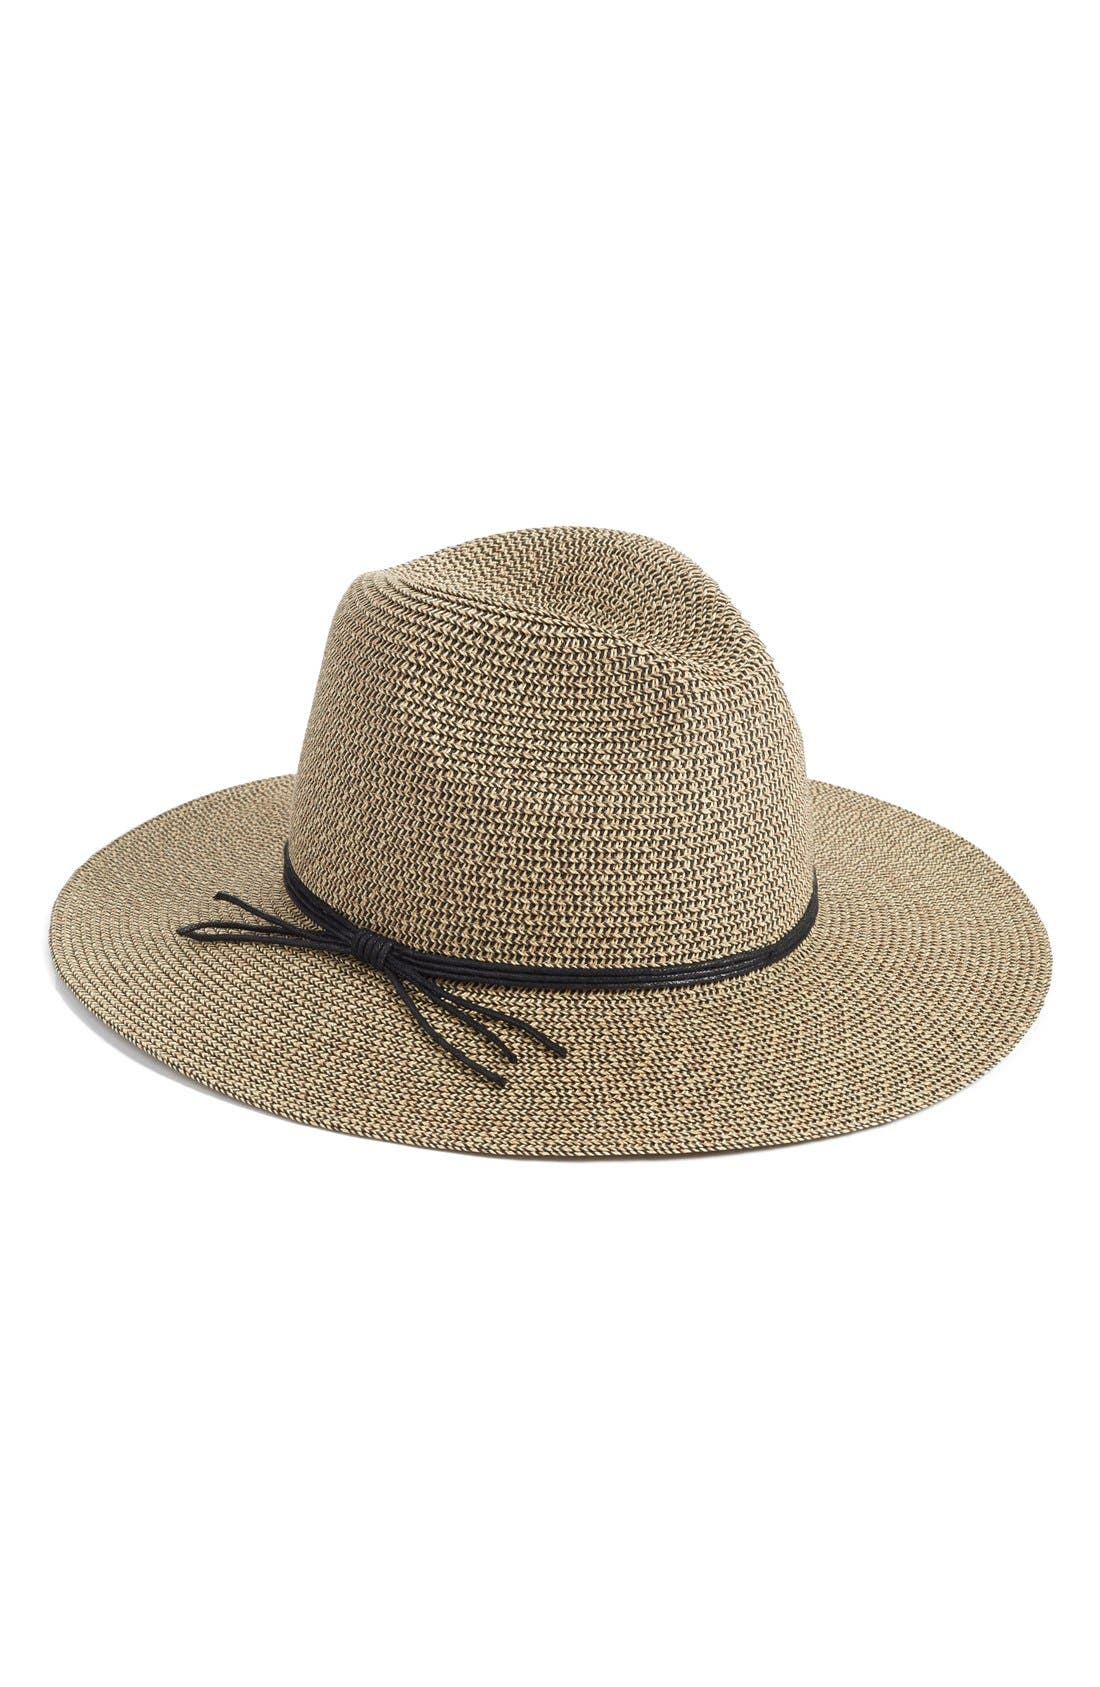 Woven Panama Hat,                         Main,                         color, 235